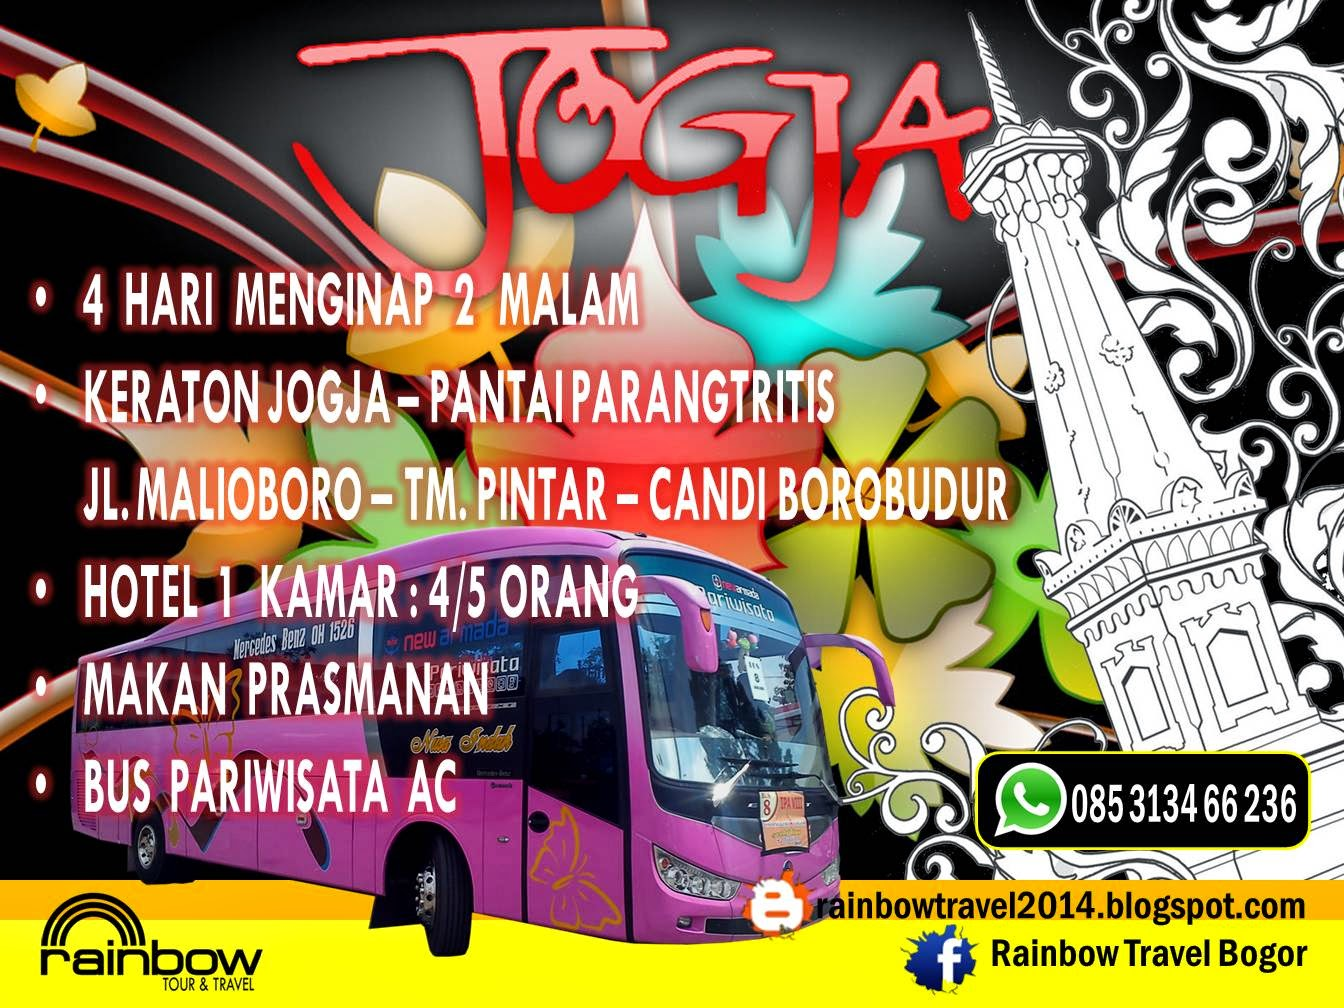 Derainbow Tour Organizer Rent A Bus Wisata Ke Jogja Murah